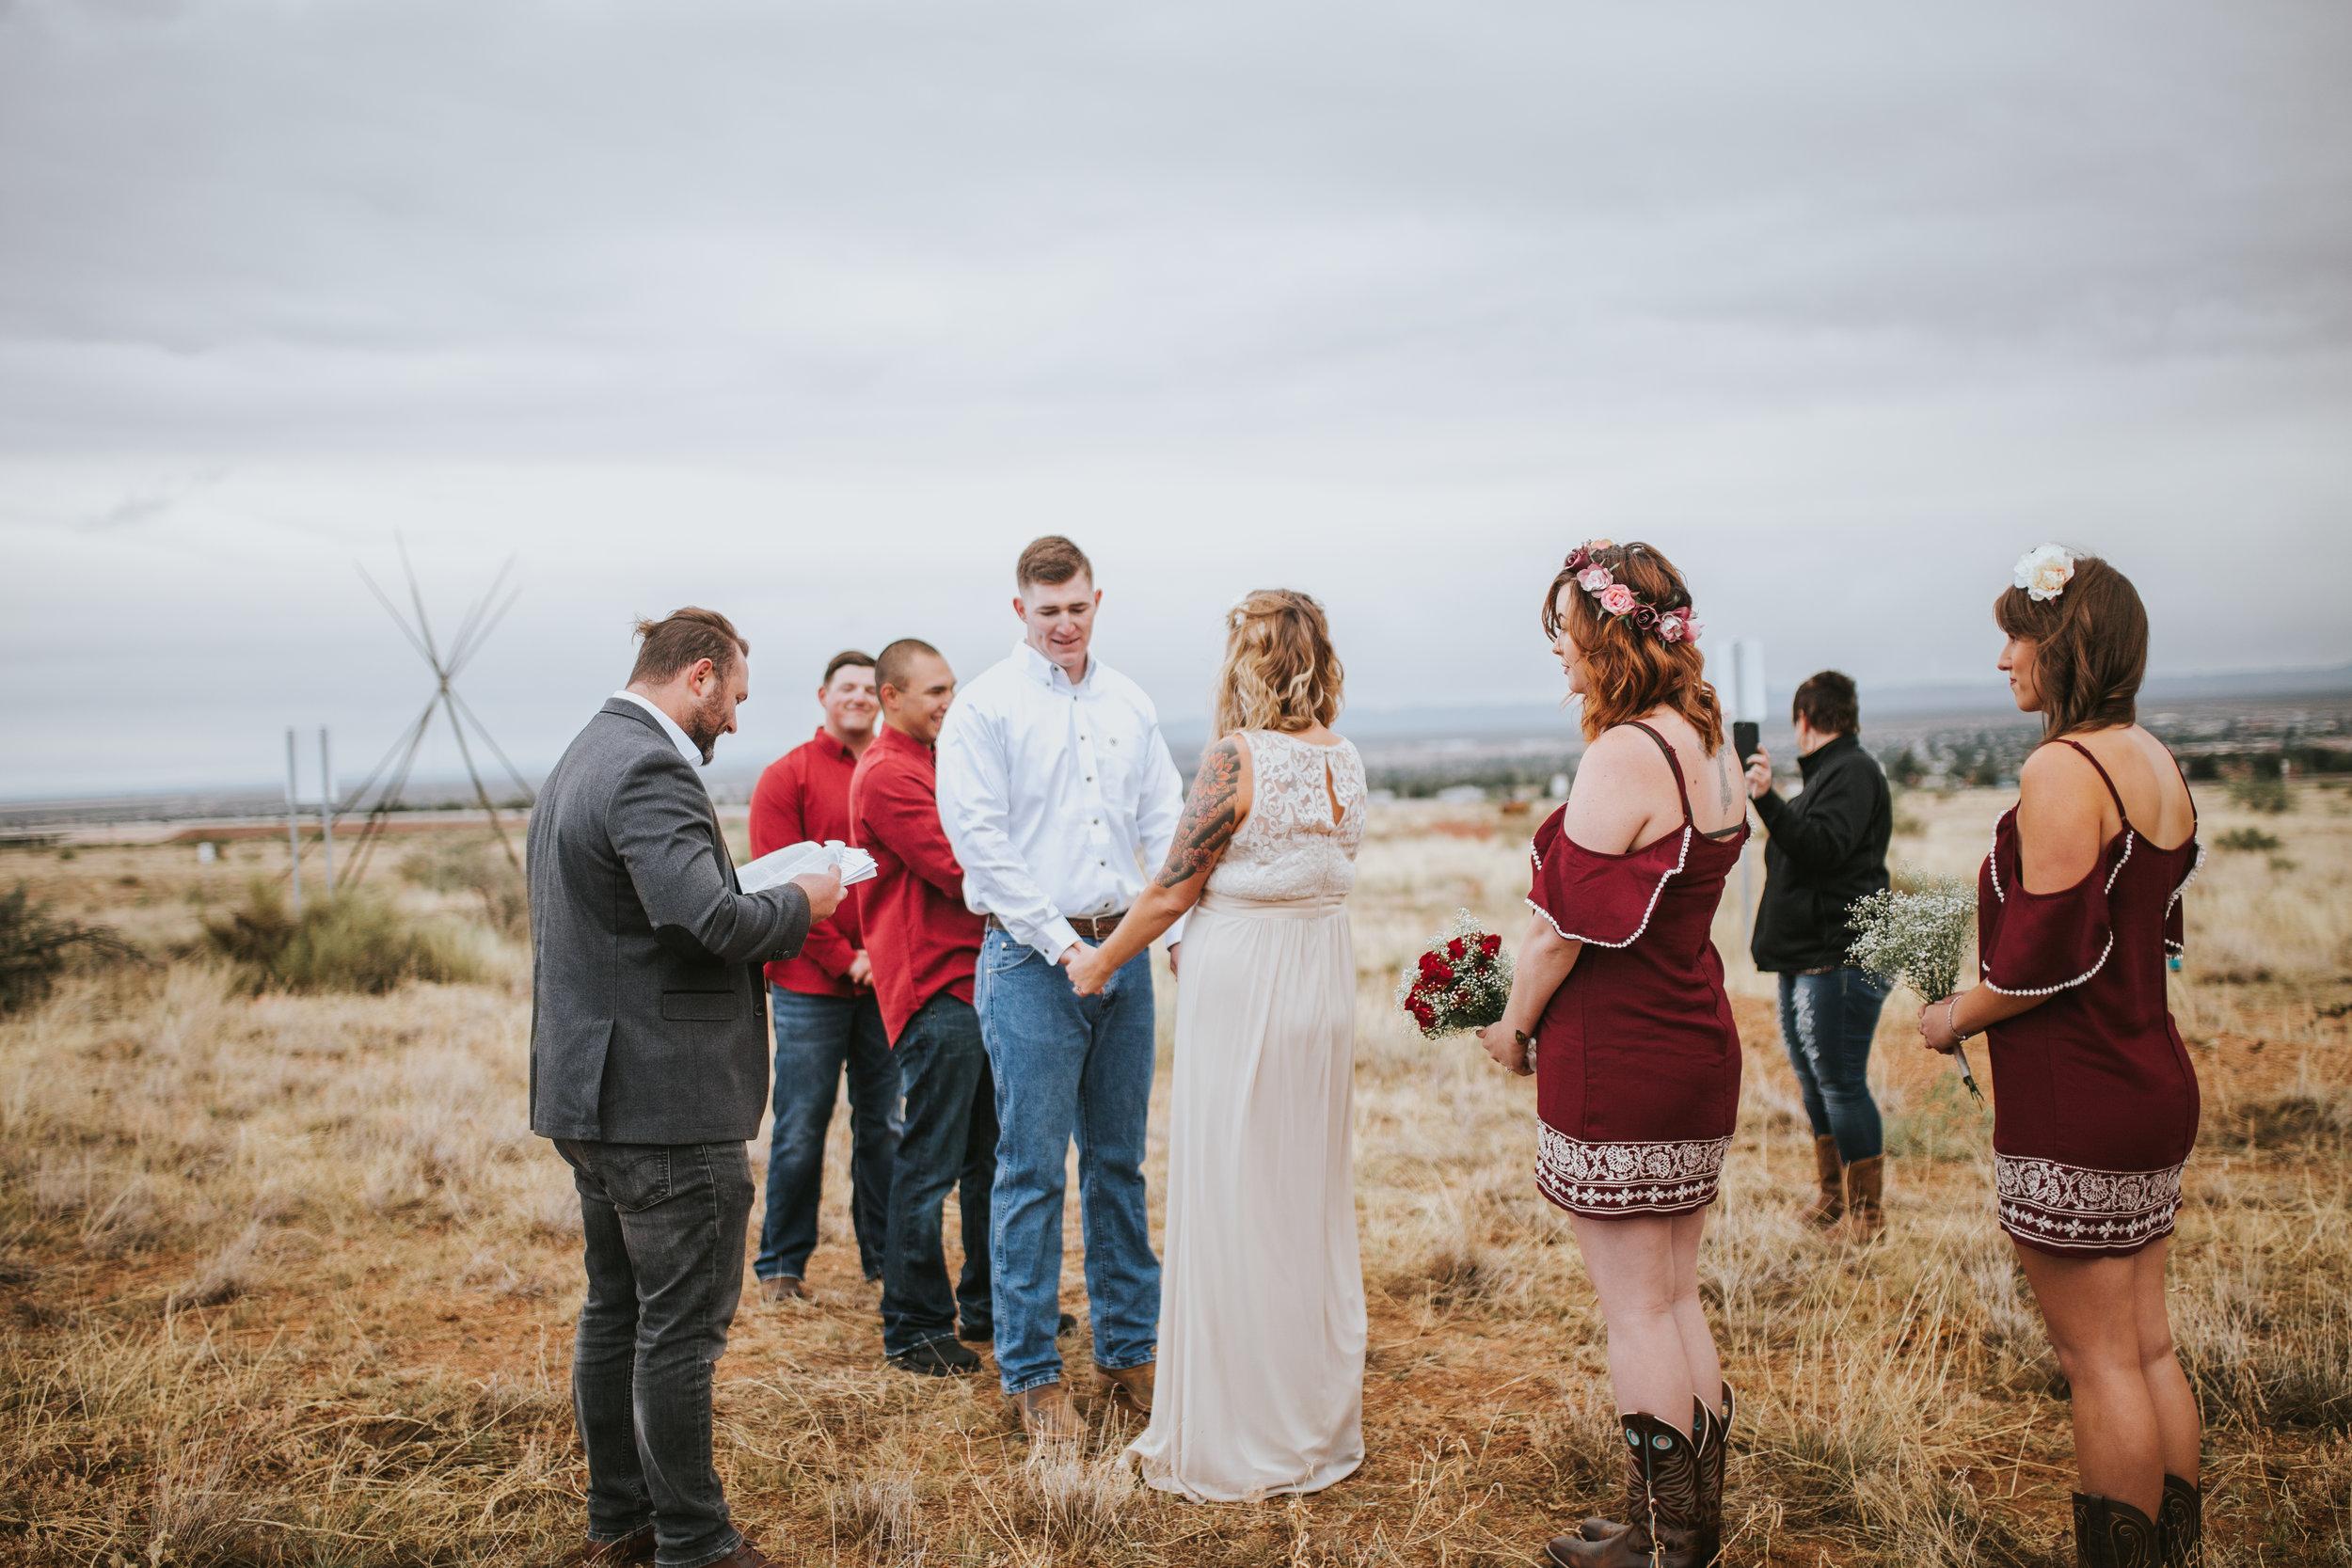 el-paso-texas-wedding-photographer-11